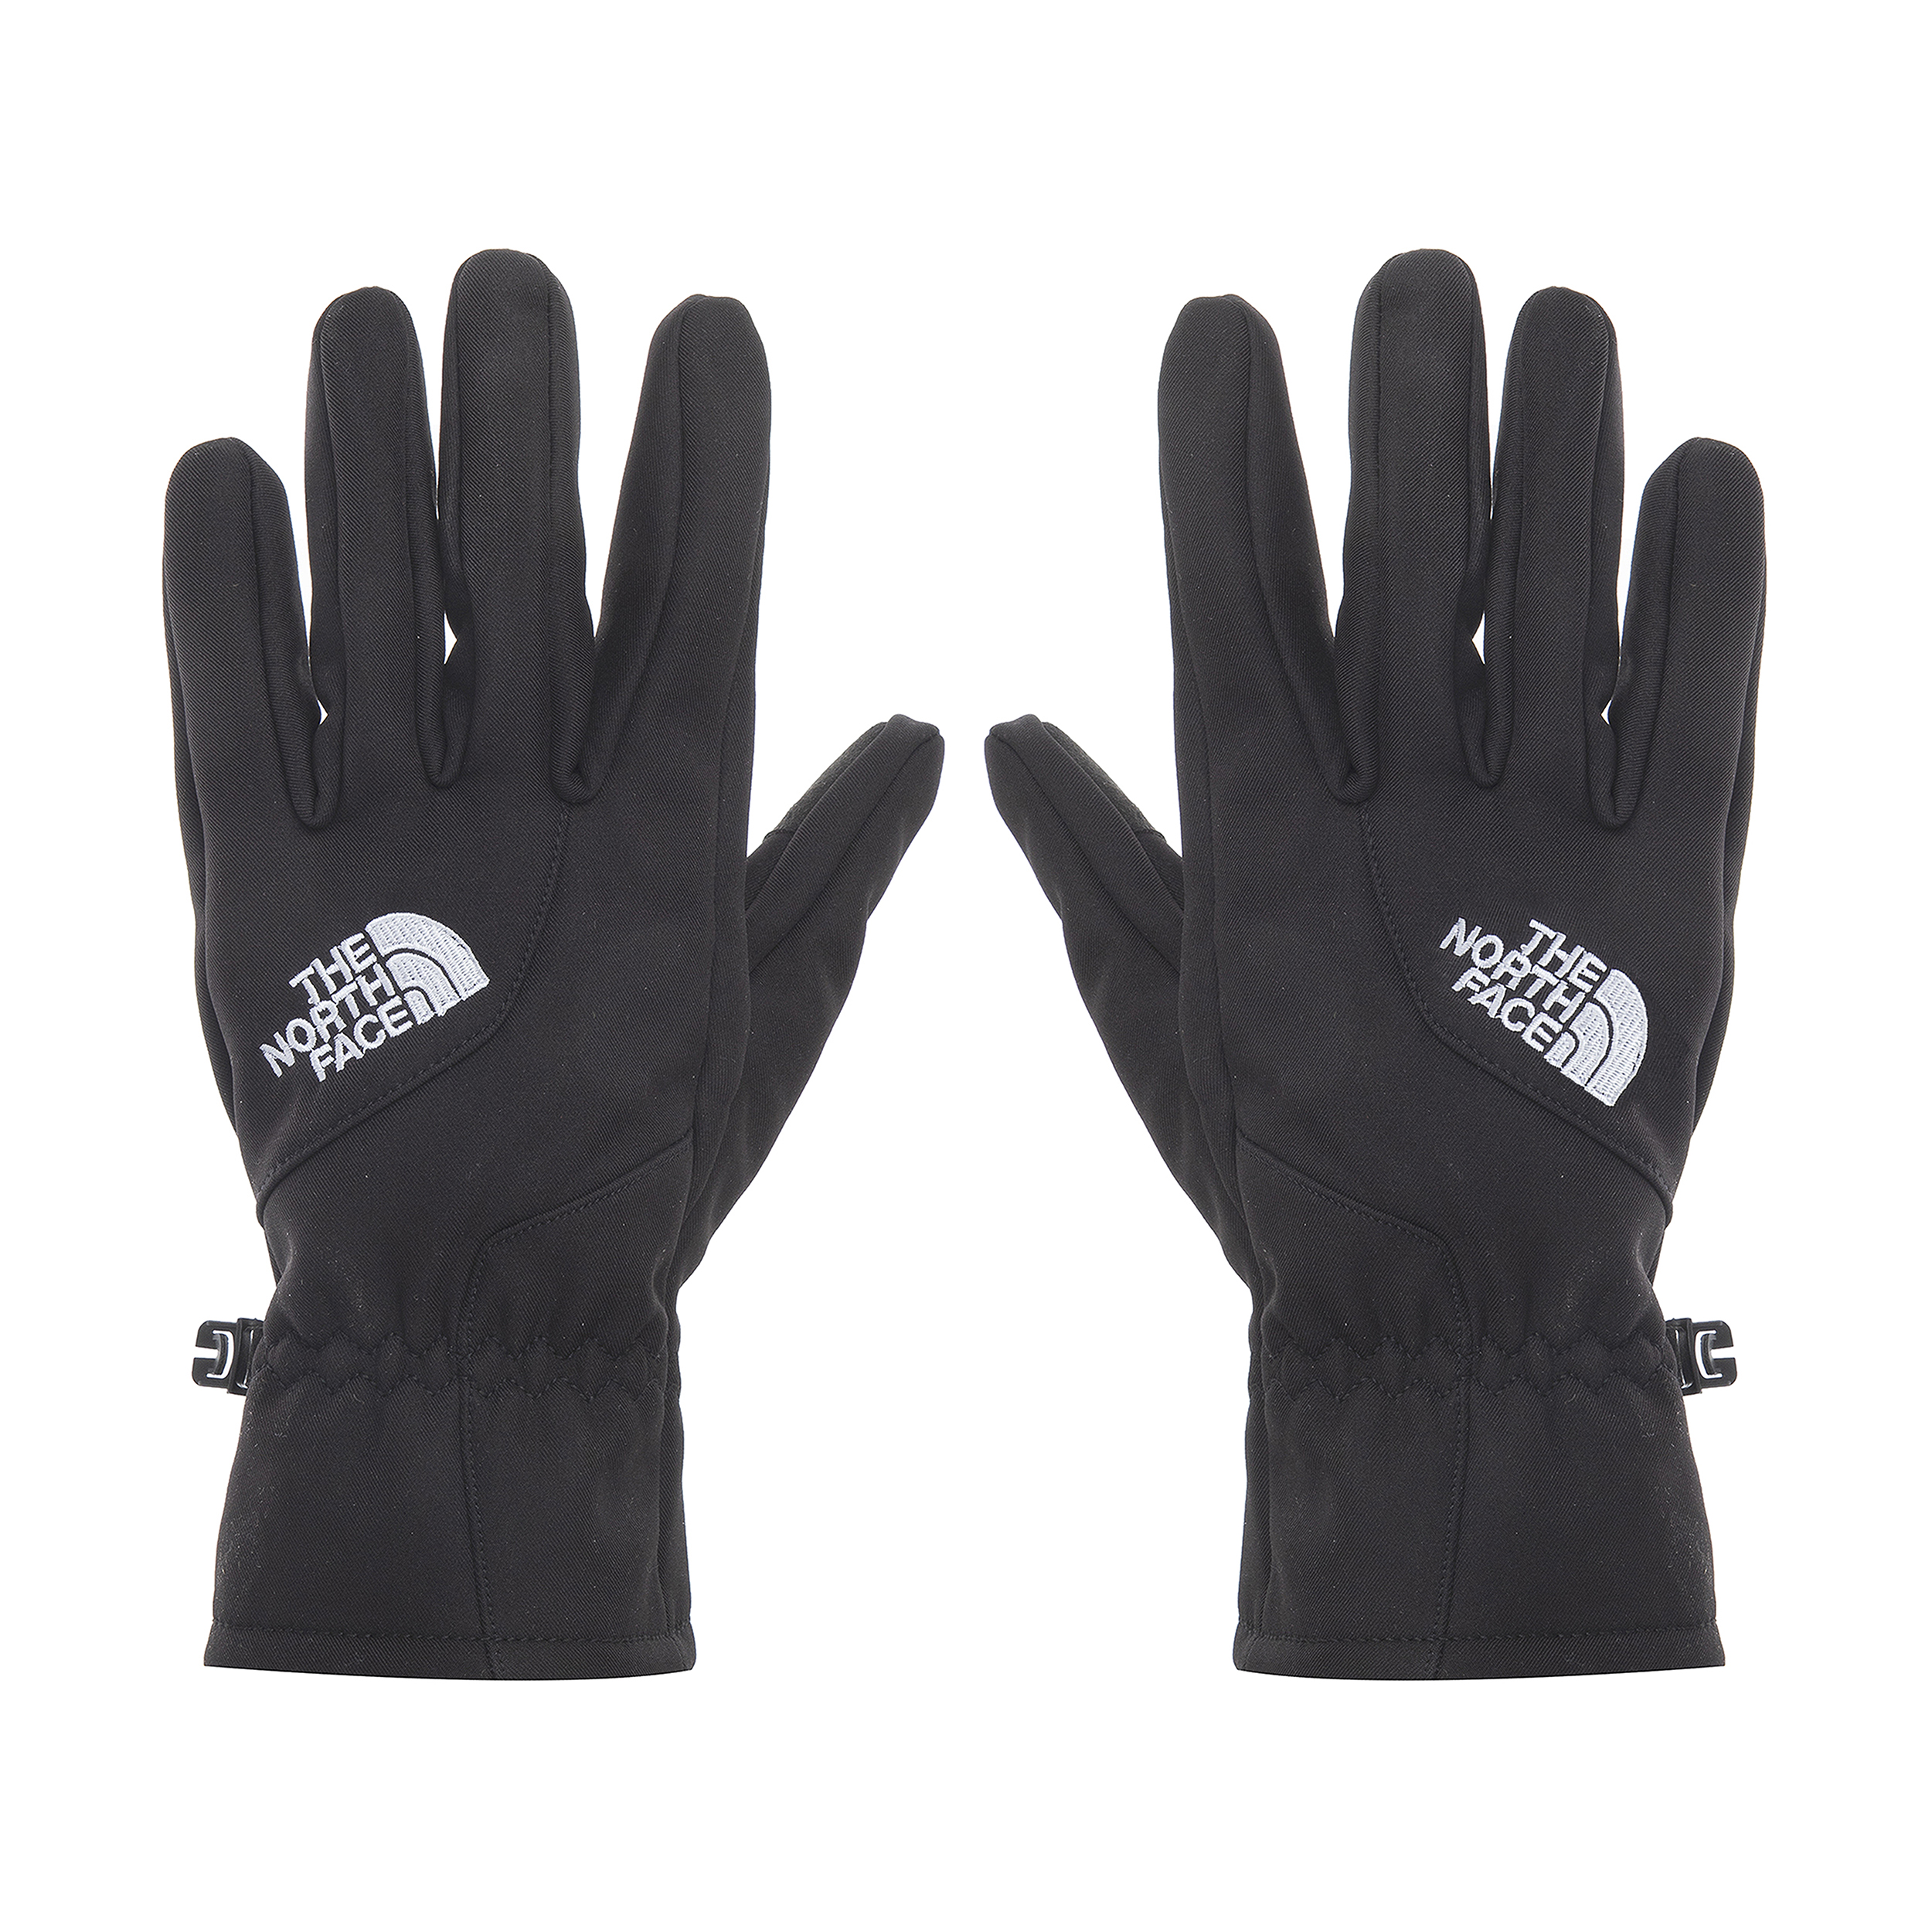 دستکش مردانه نورث فیس مدل GH-881